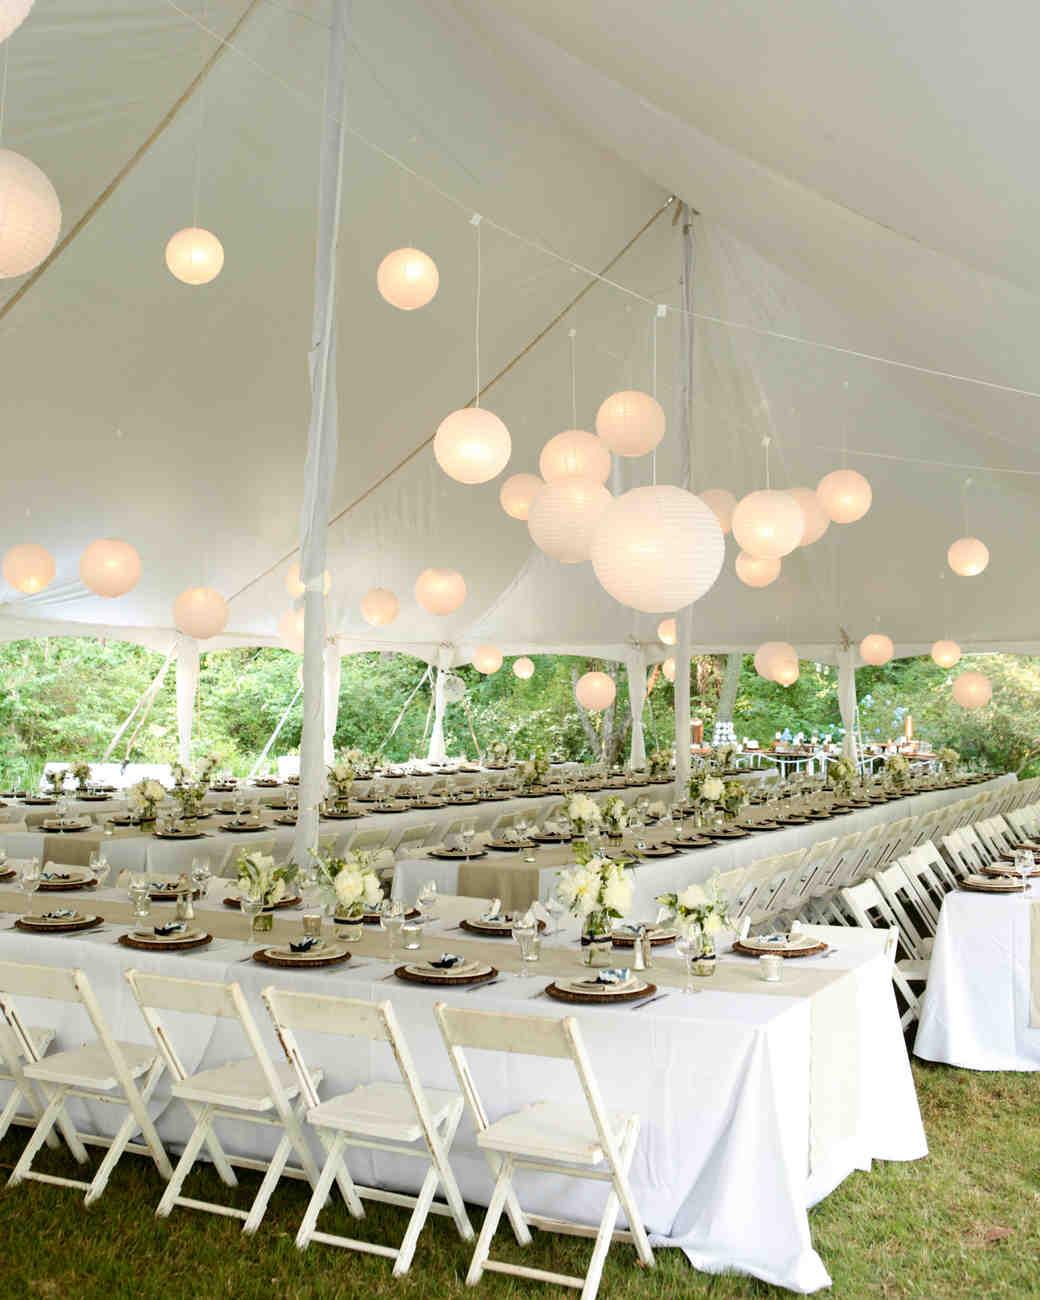 33 Tent Decorating Ideas To Upgrade Your Wedding Reception | Martha Stewart  Weddings